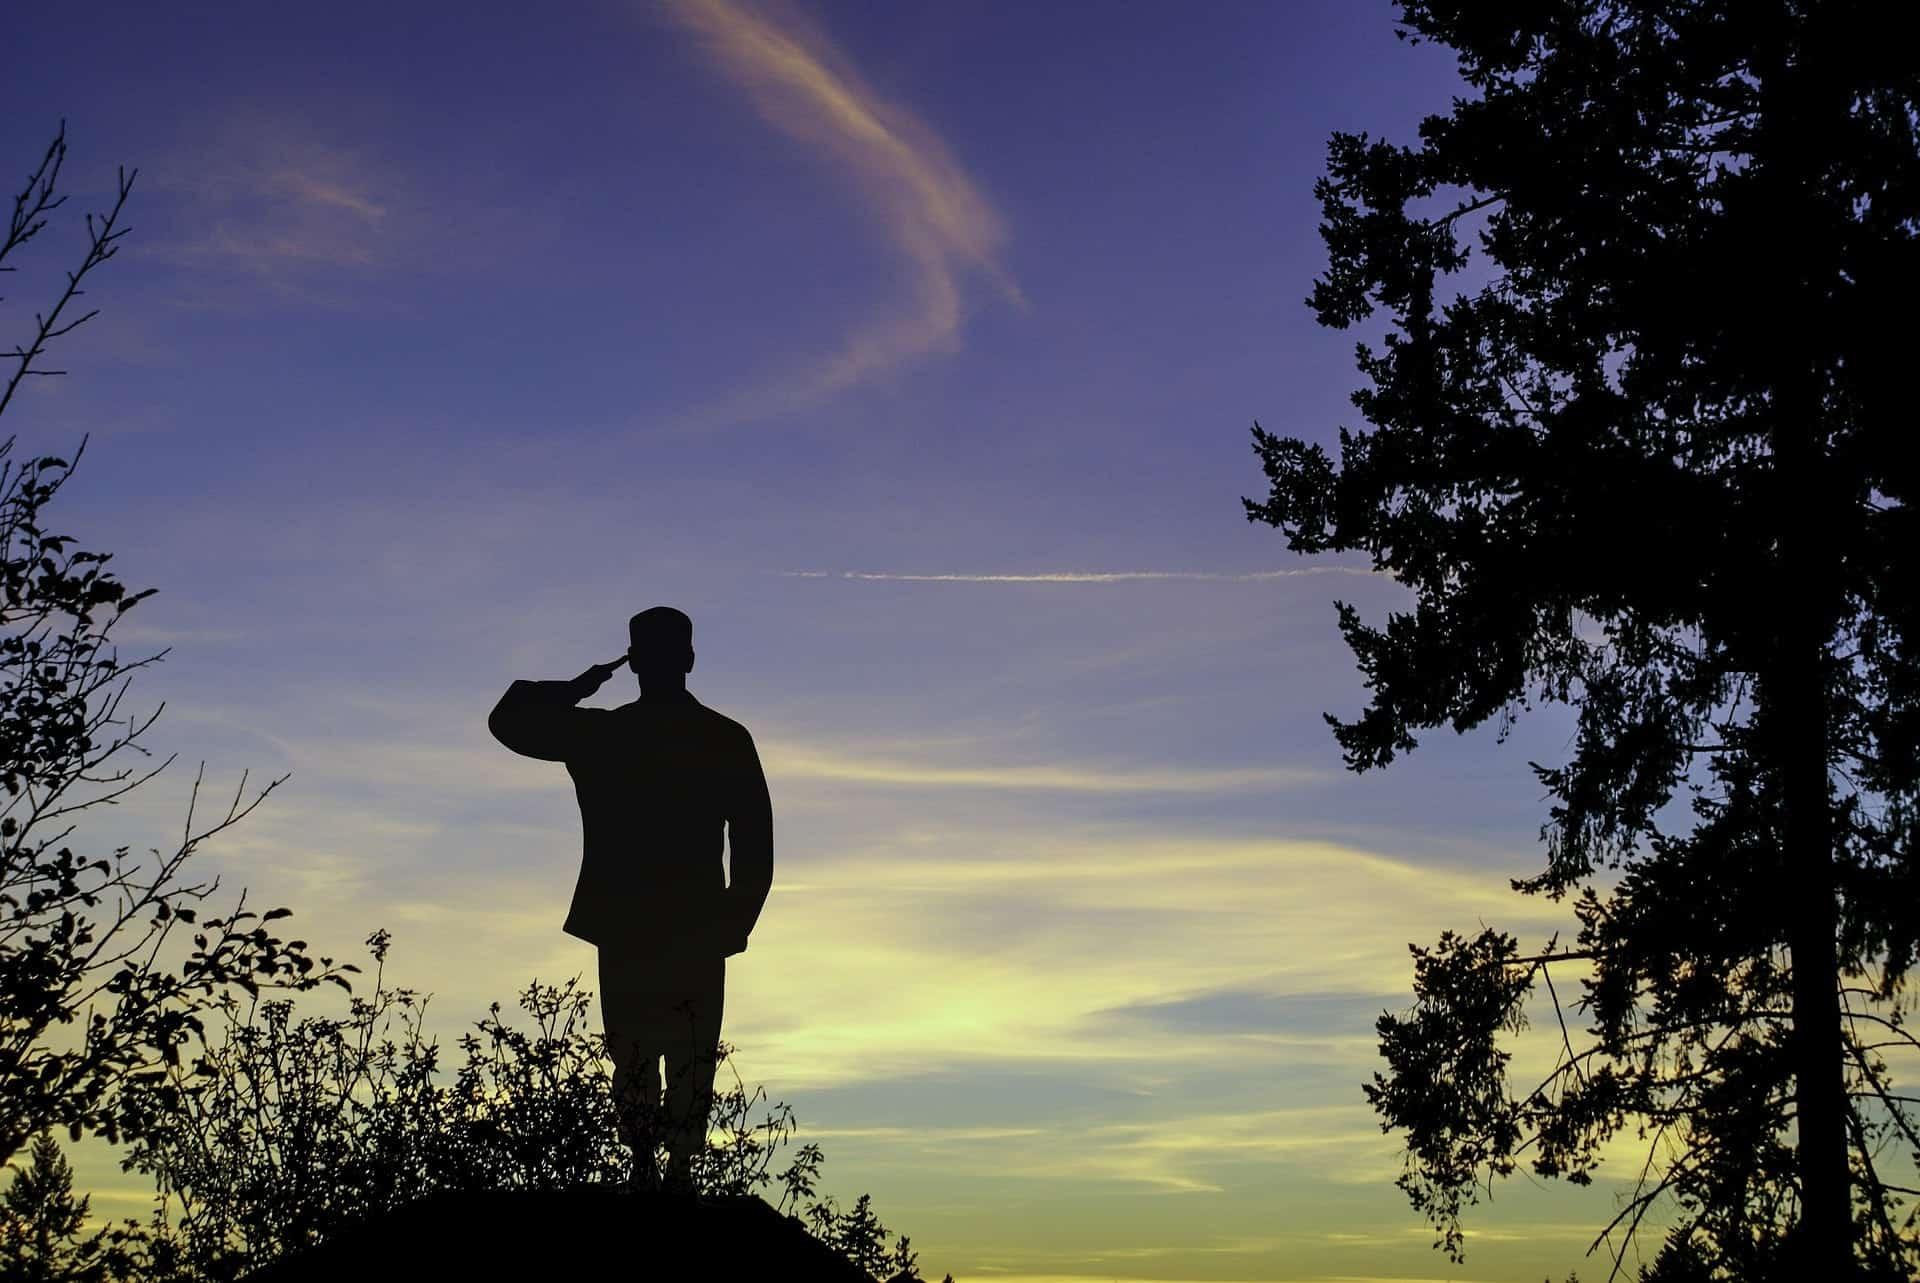 saluting-veteran-silhouette